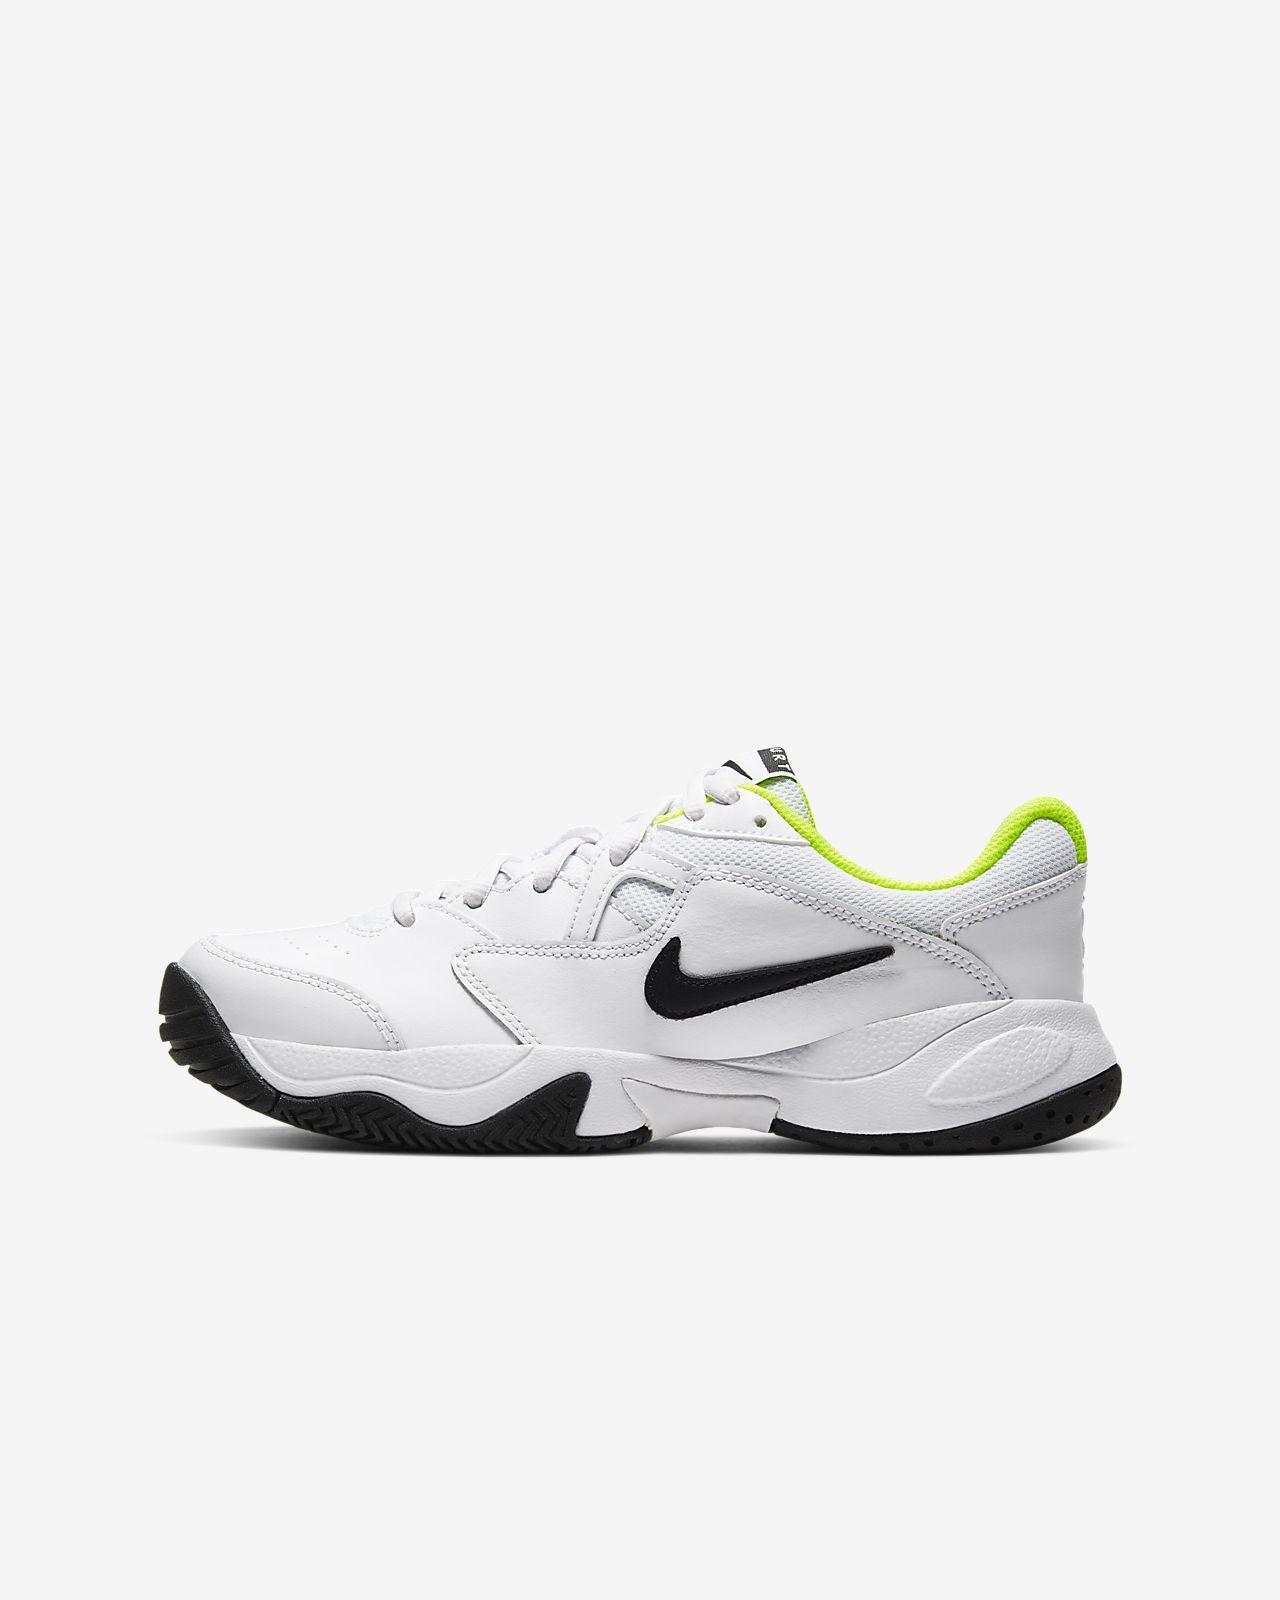 Nike Air Max Plus 3 Schuh für ältere Kinder. Nike BE